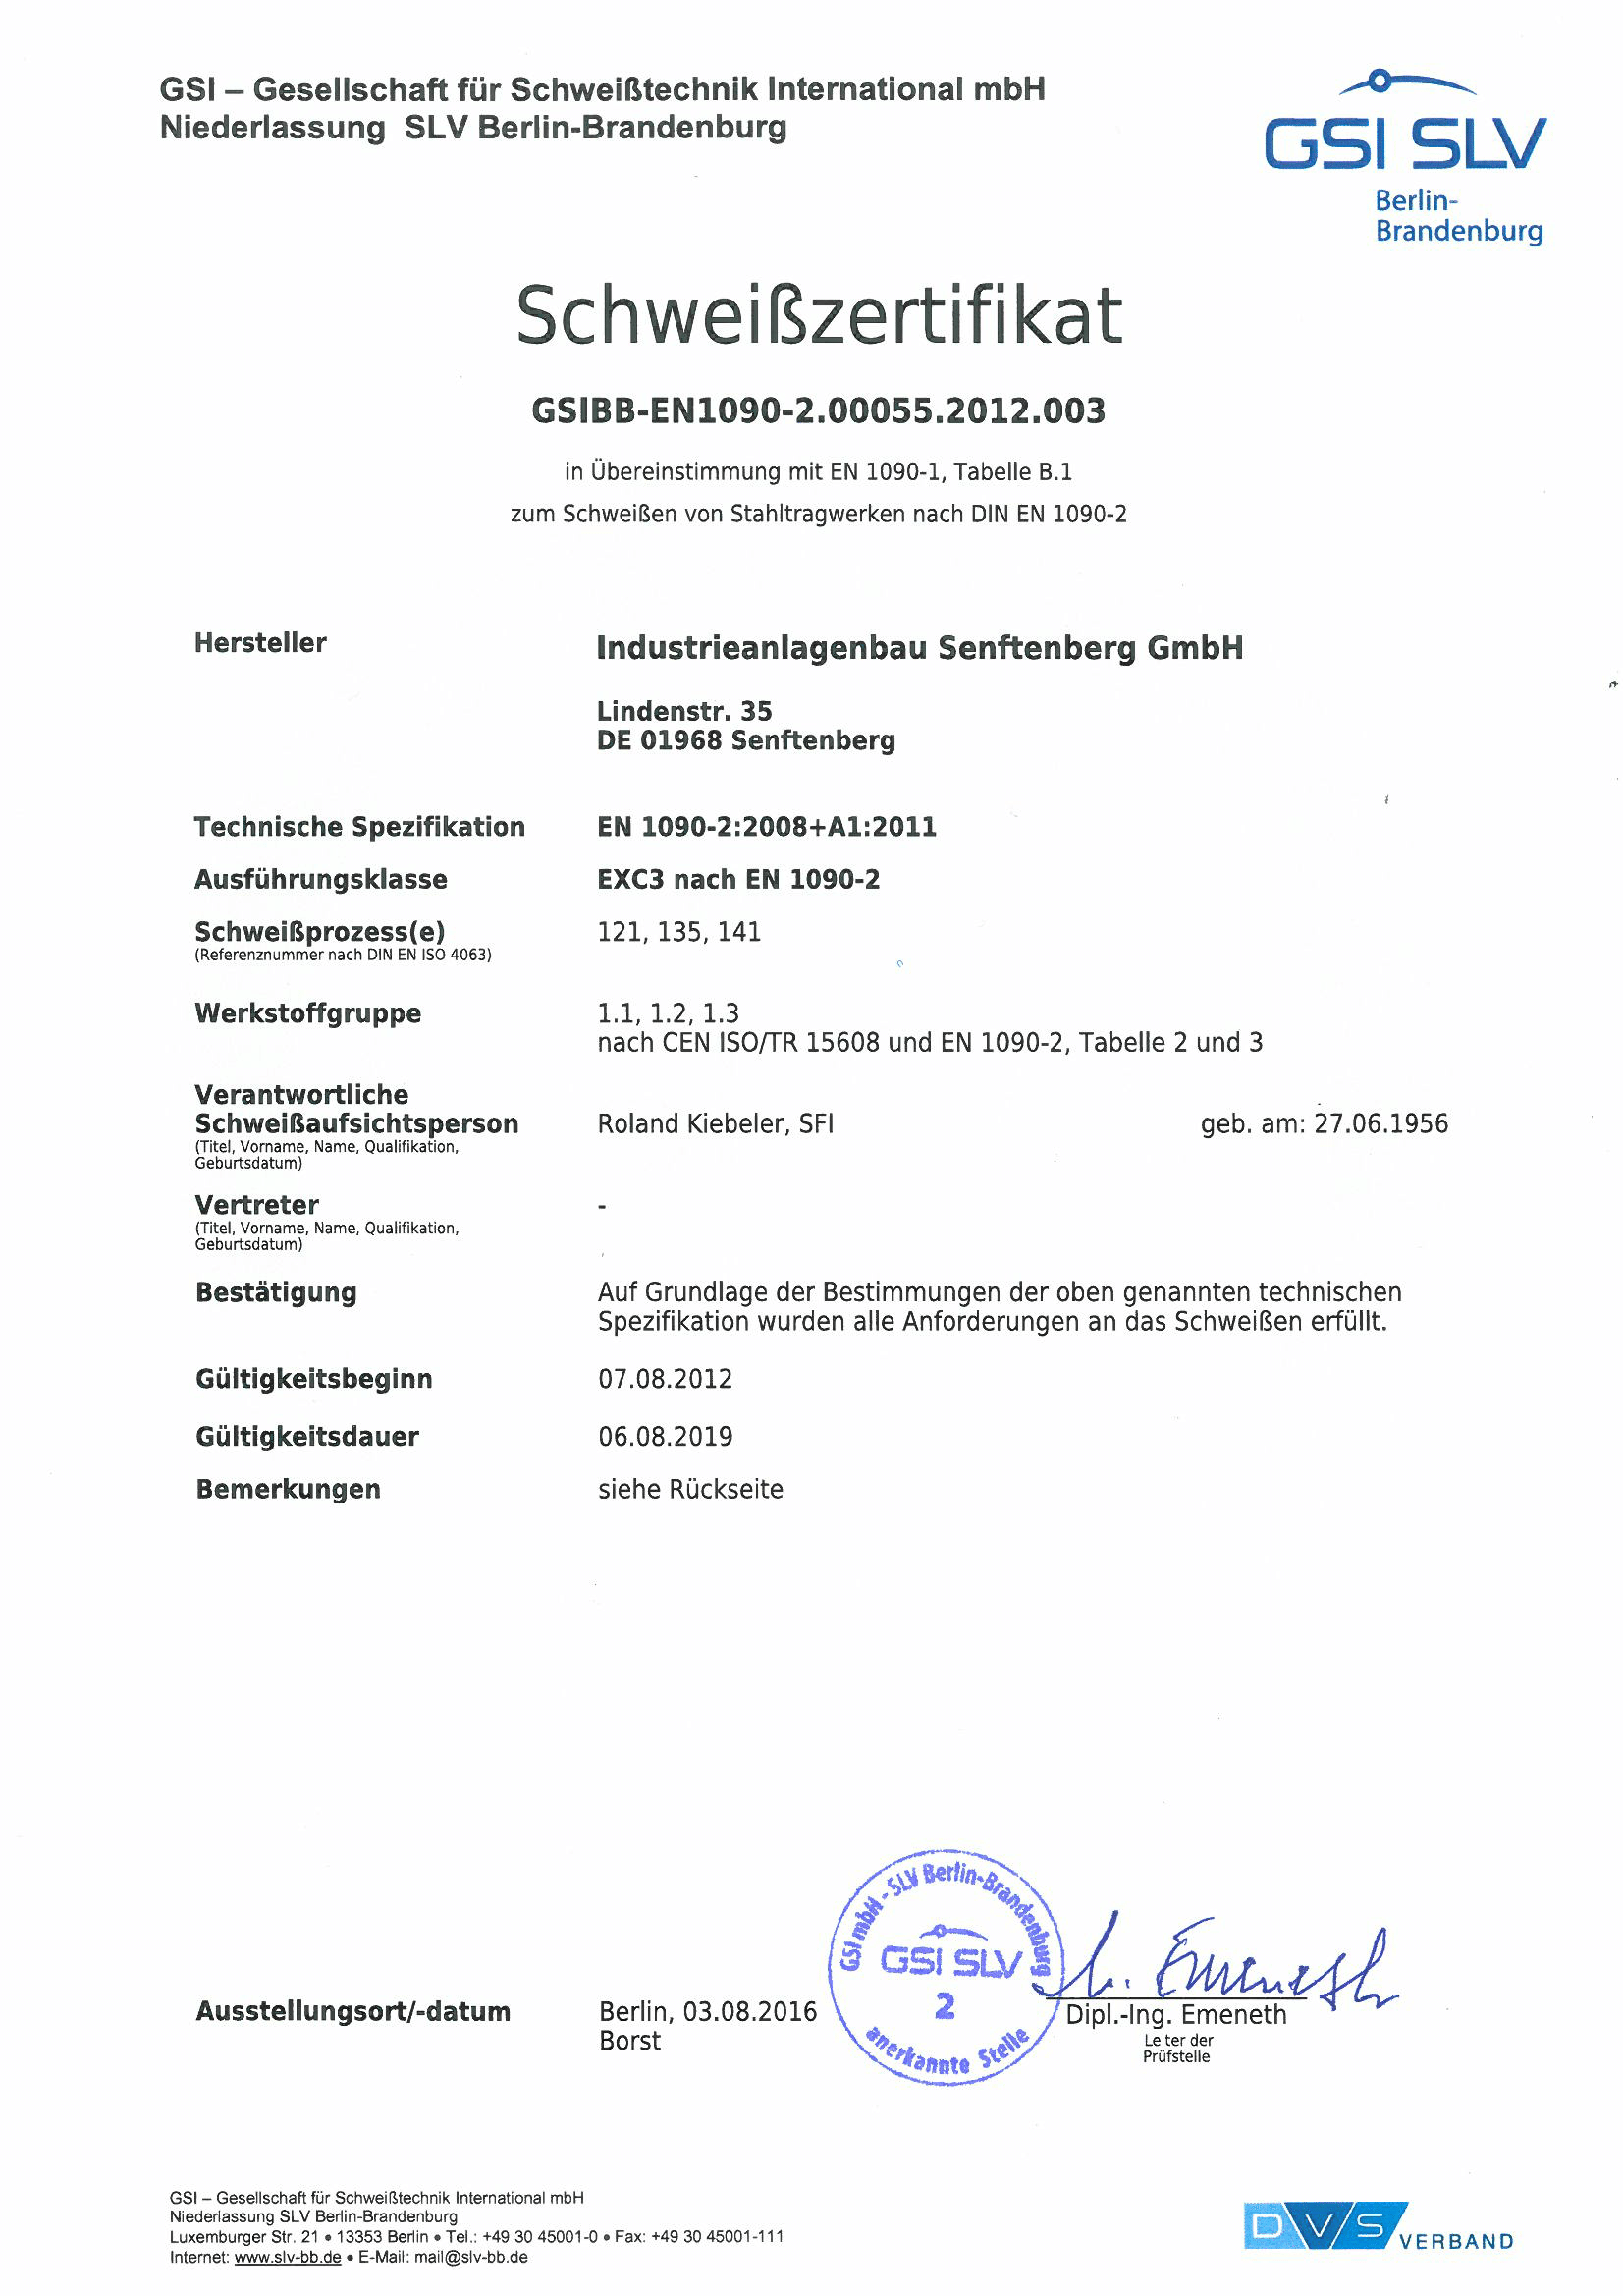 schweisszertifikat-bis-06-08-19-1